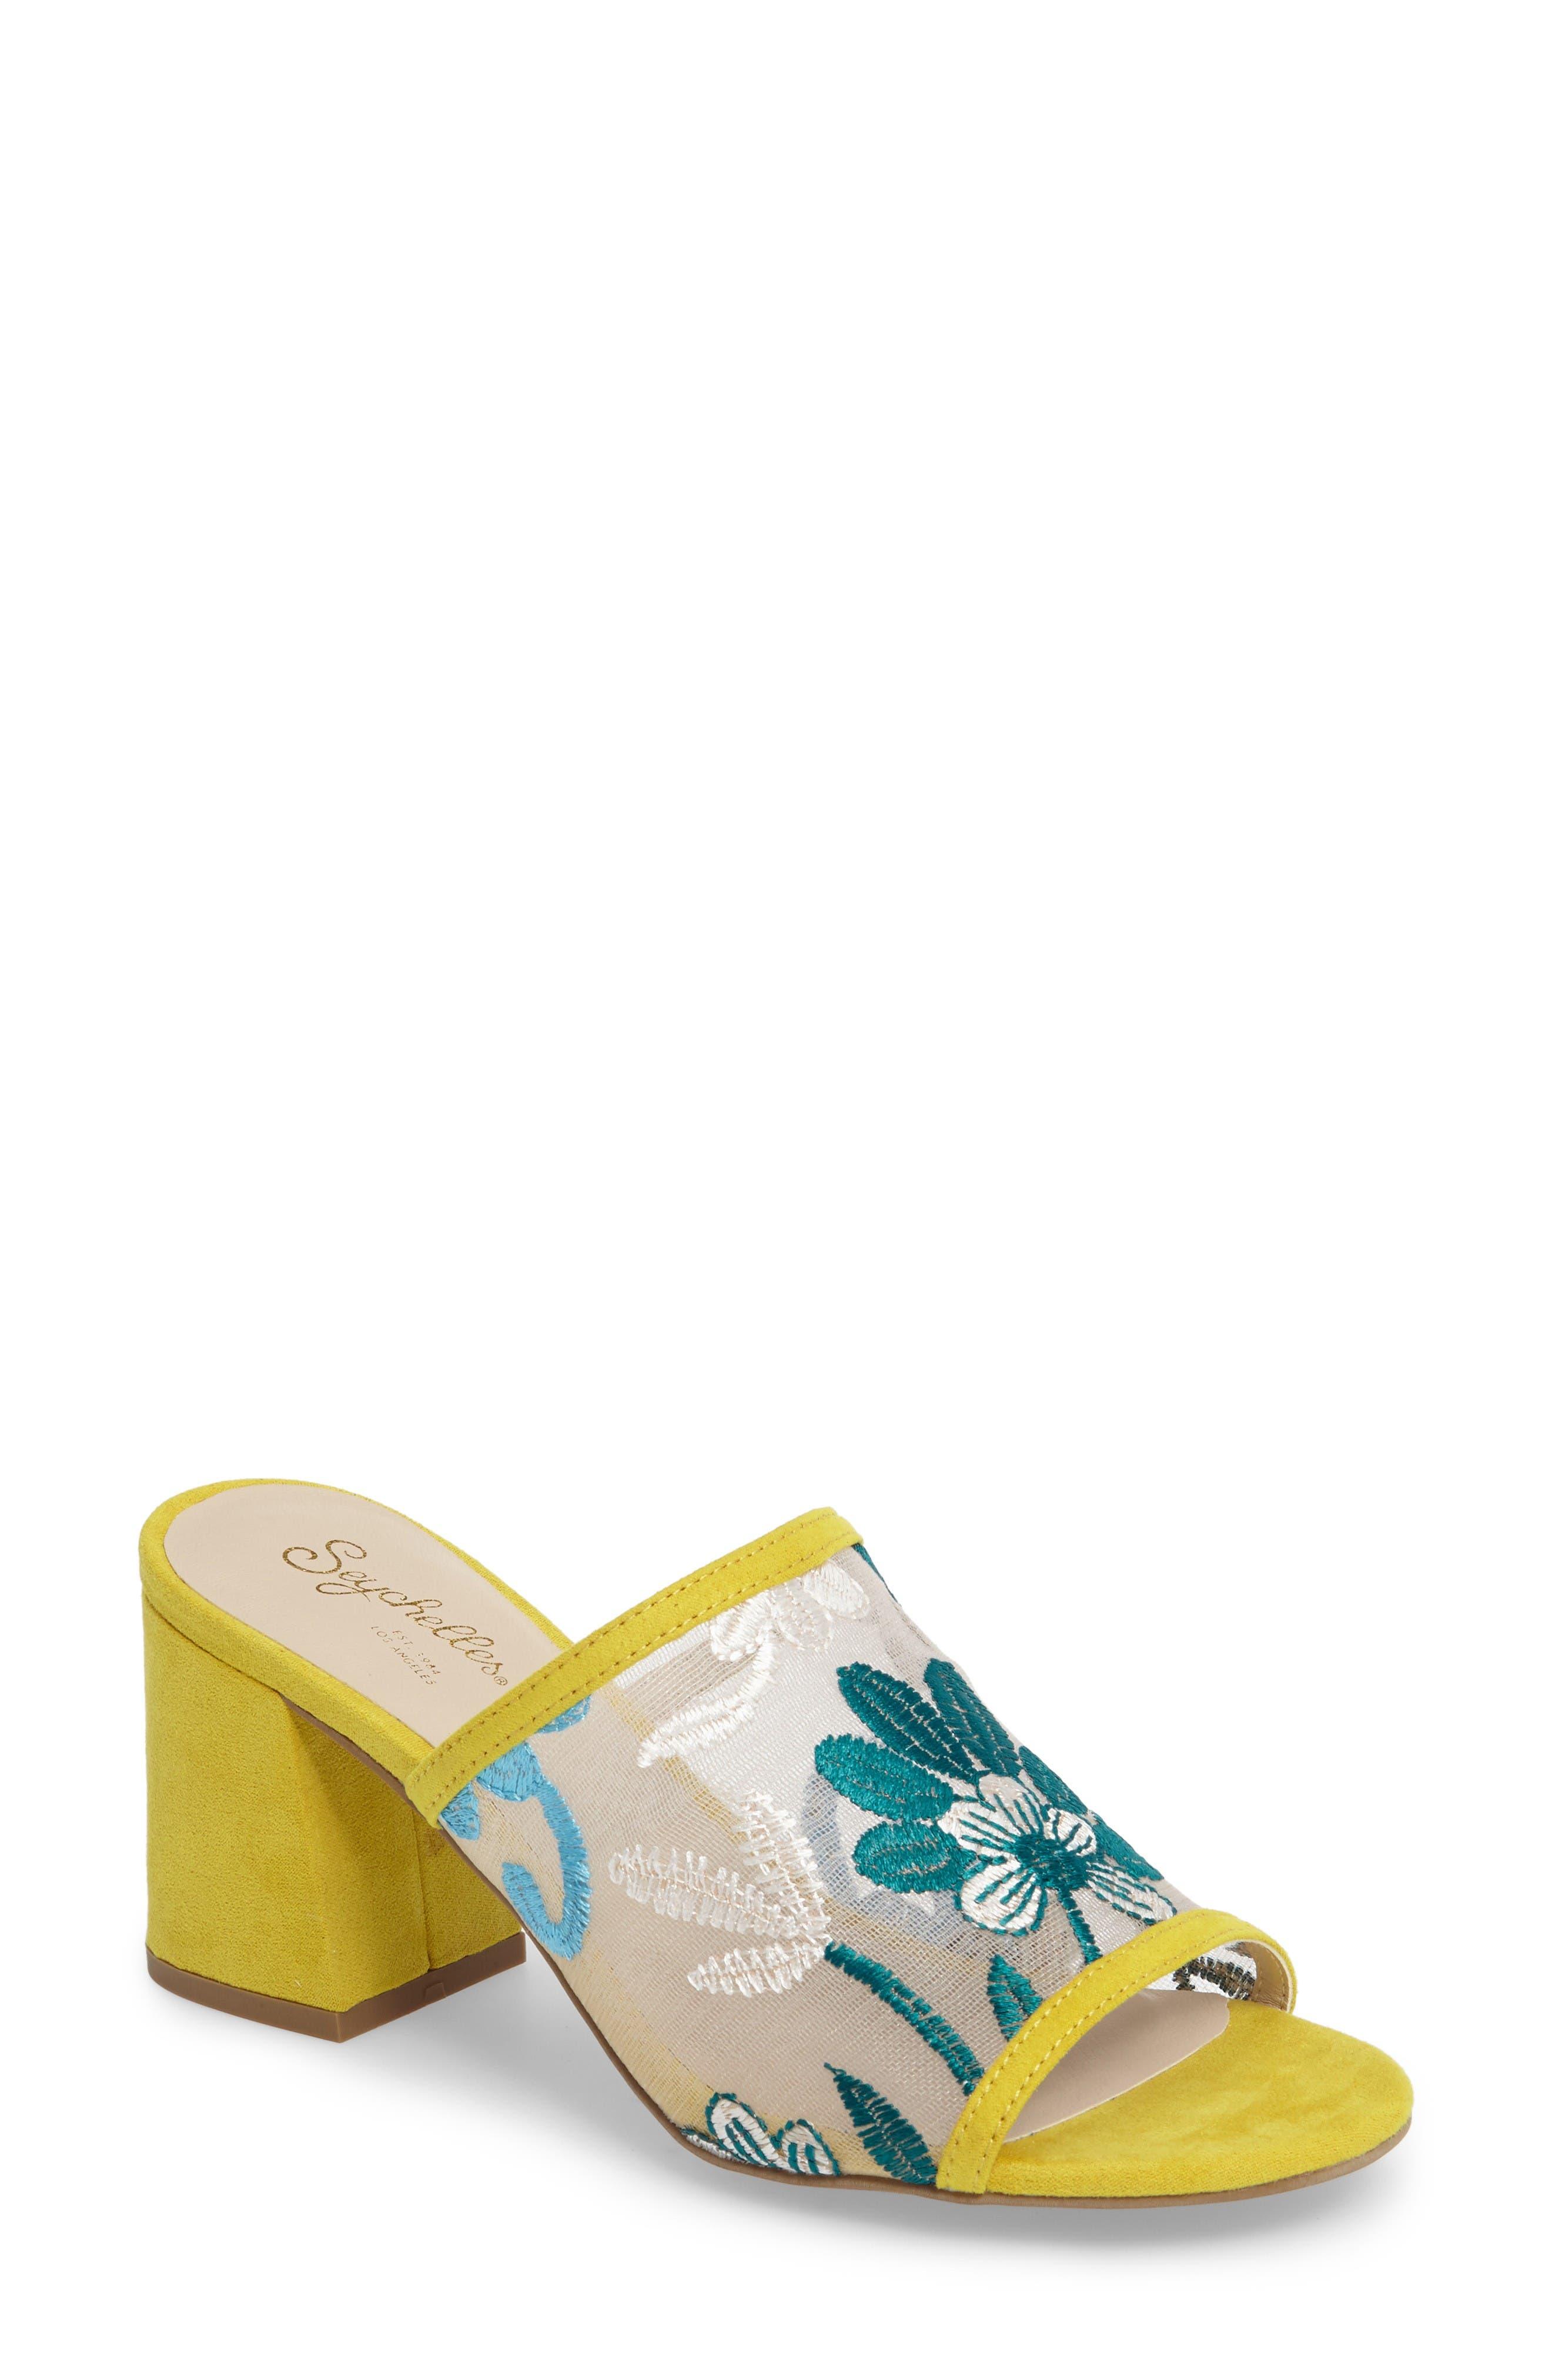 Nursery Block Heel Sandal,                         Main,                         color, Yellow Suede